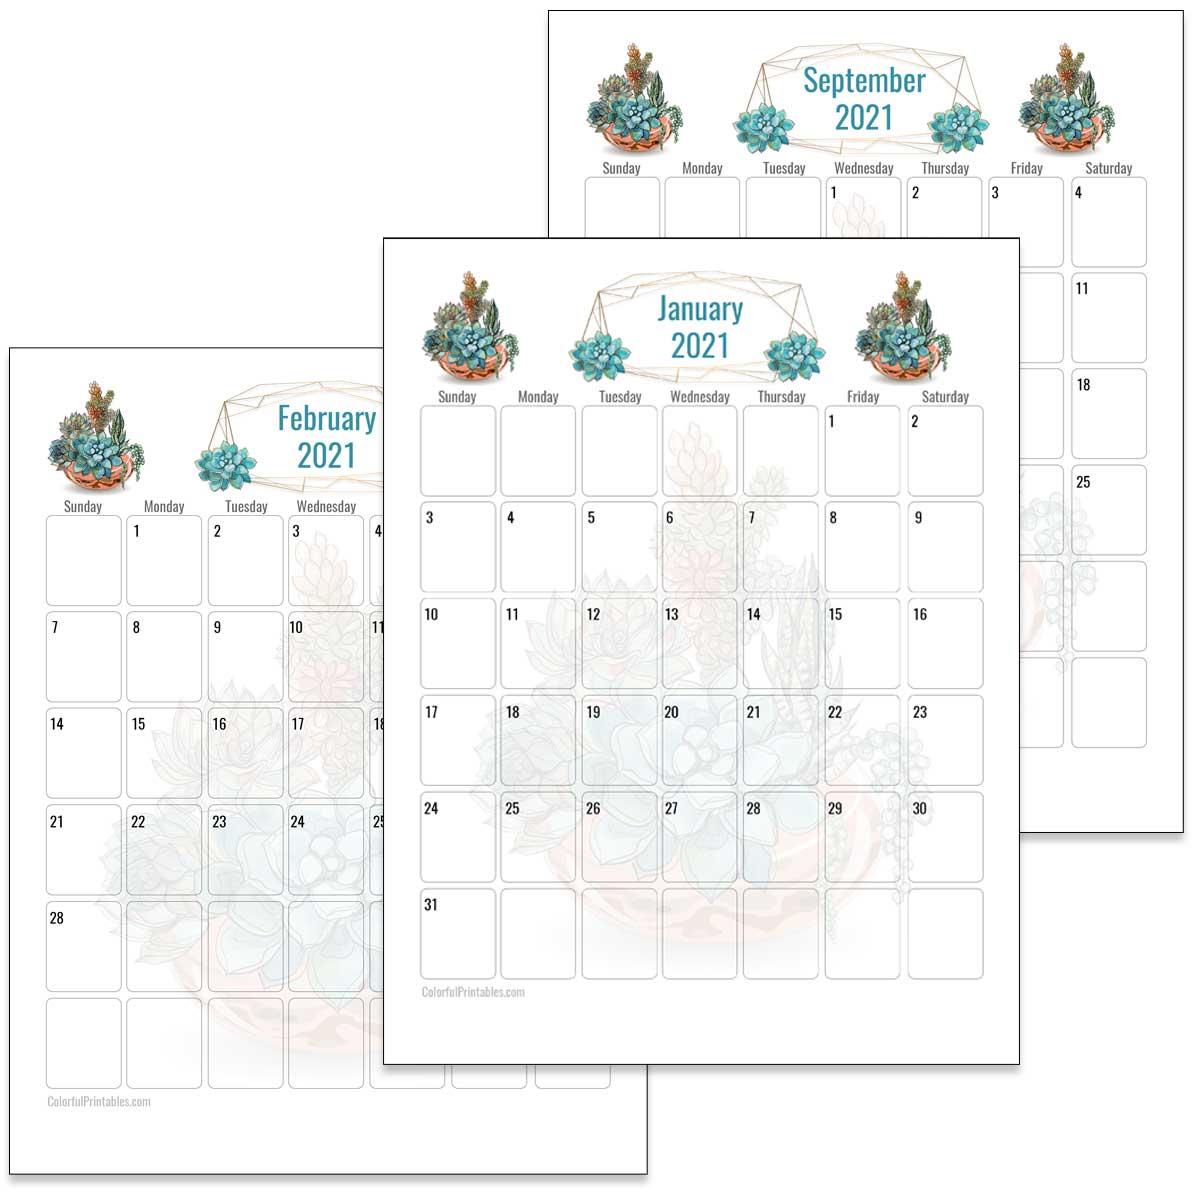 Succulent calendar for 2021